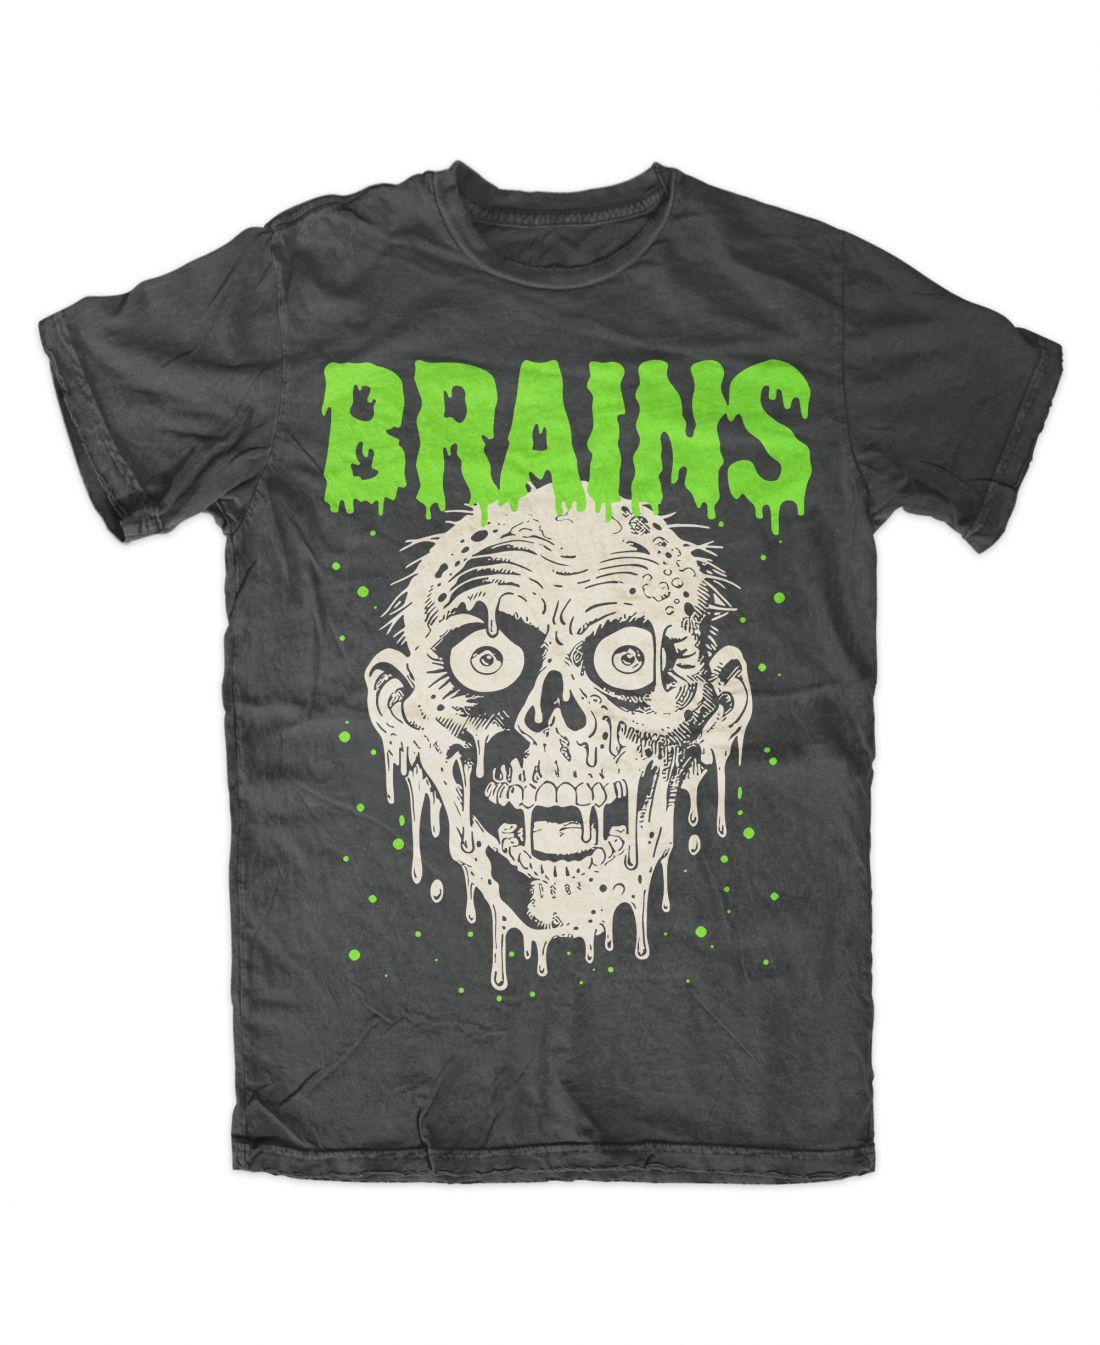 Brains (charcoal póló)